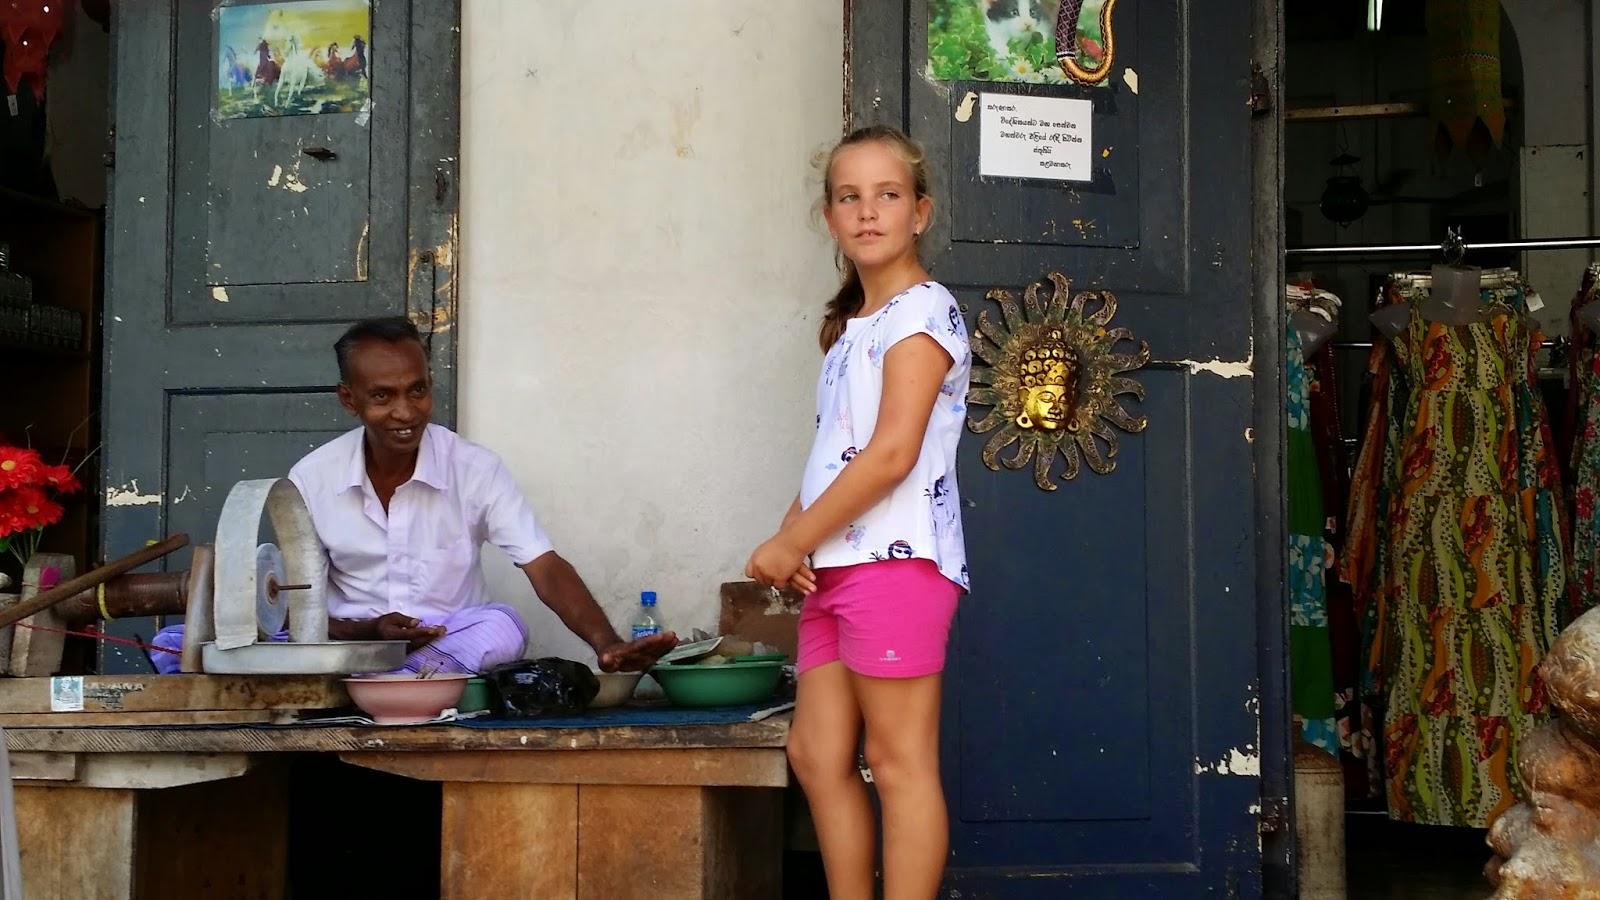 Tienda de souvenirs en Galle (Sri Lanka)